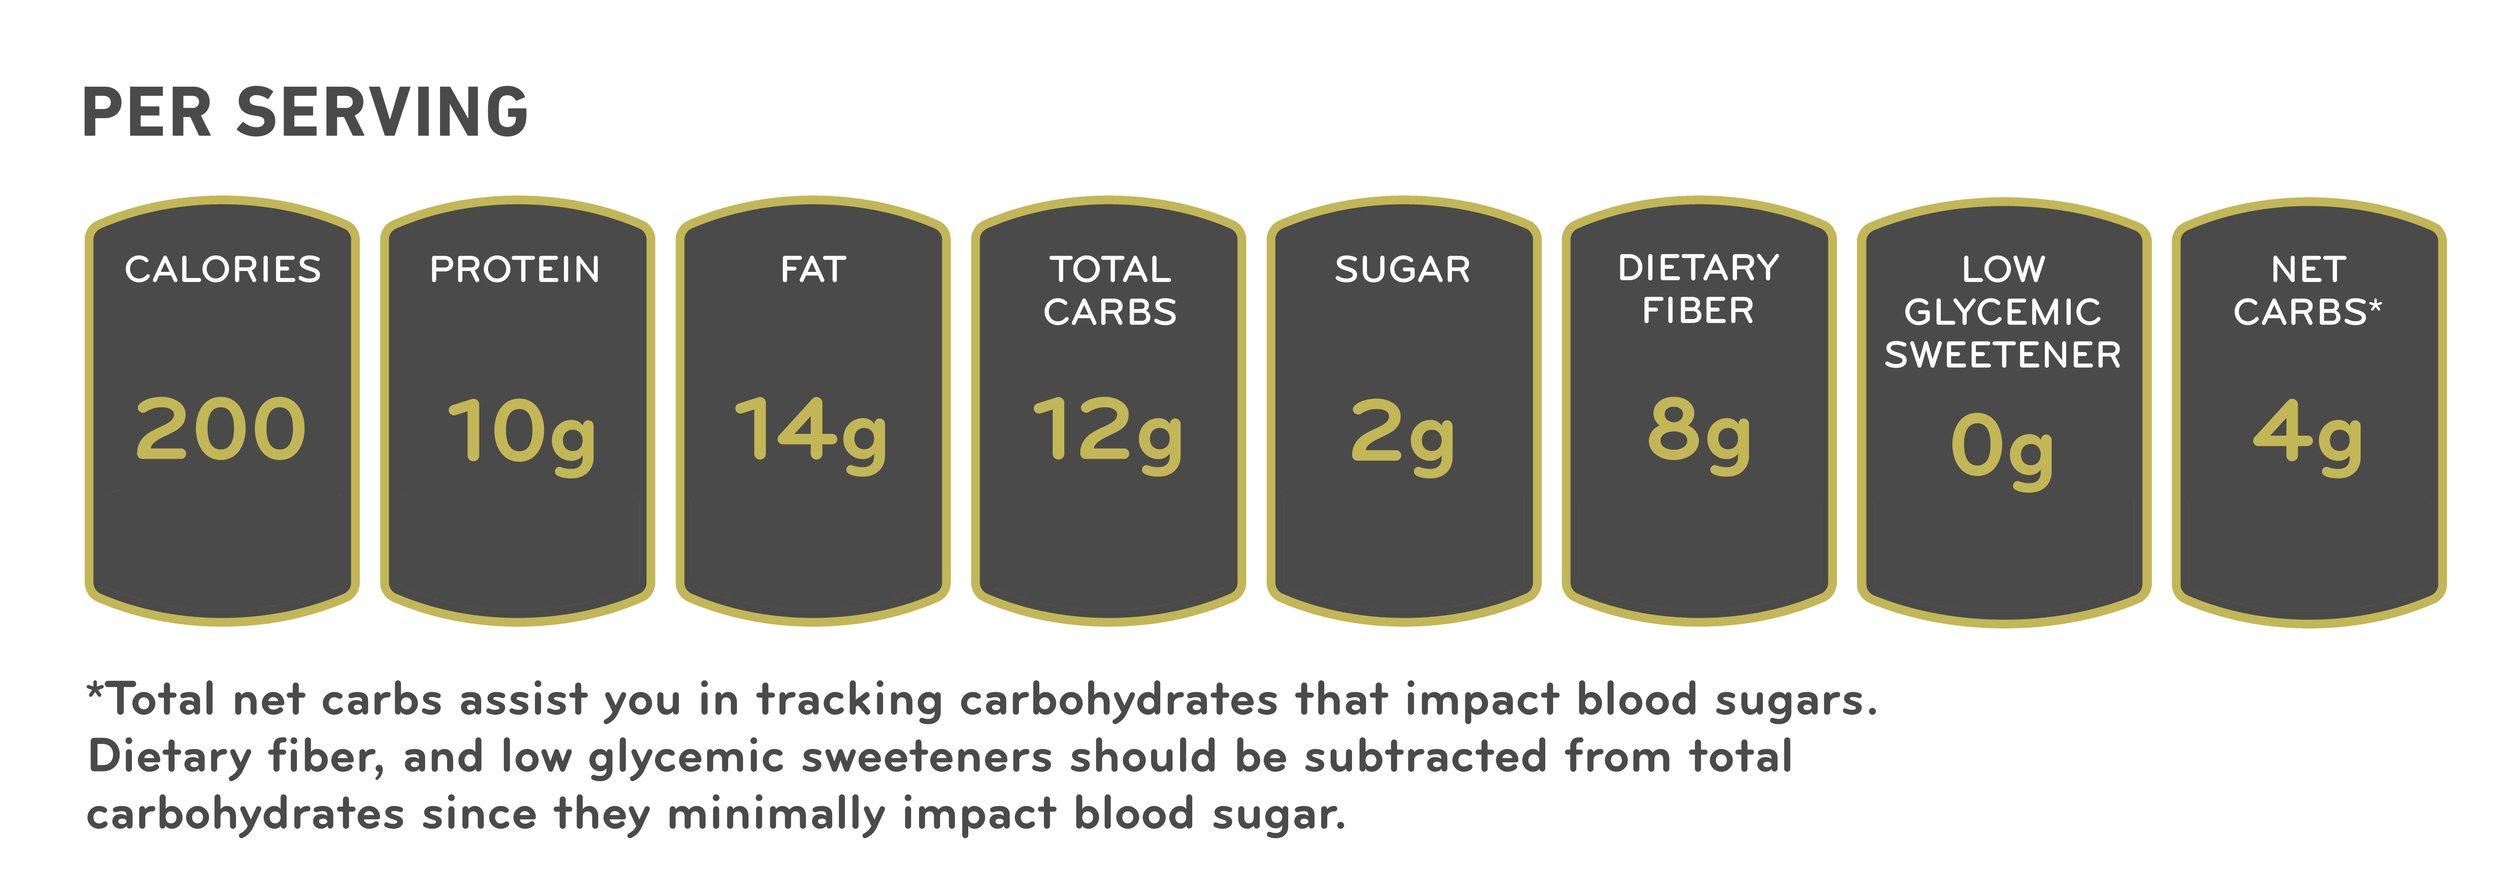 BEST LOW CARB KETO WHOLEGRAIN KETO ROLLS NUTRITION FACTS.jpg